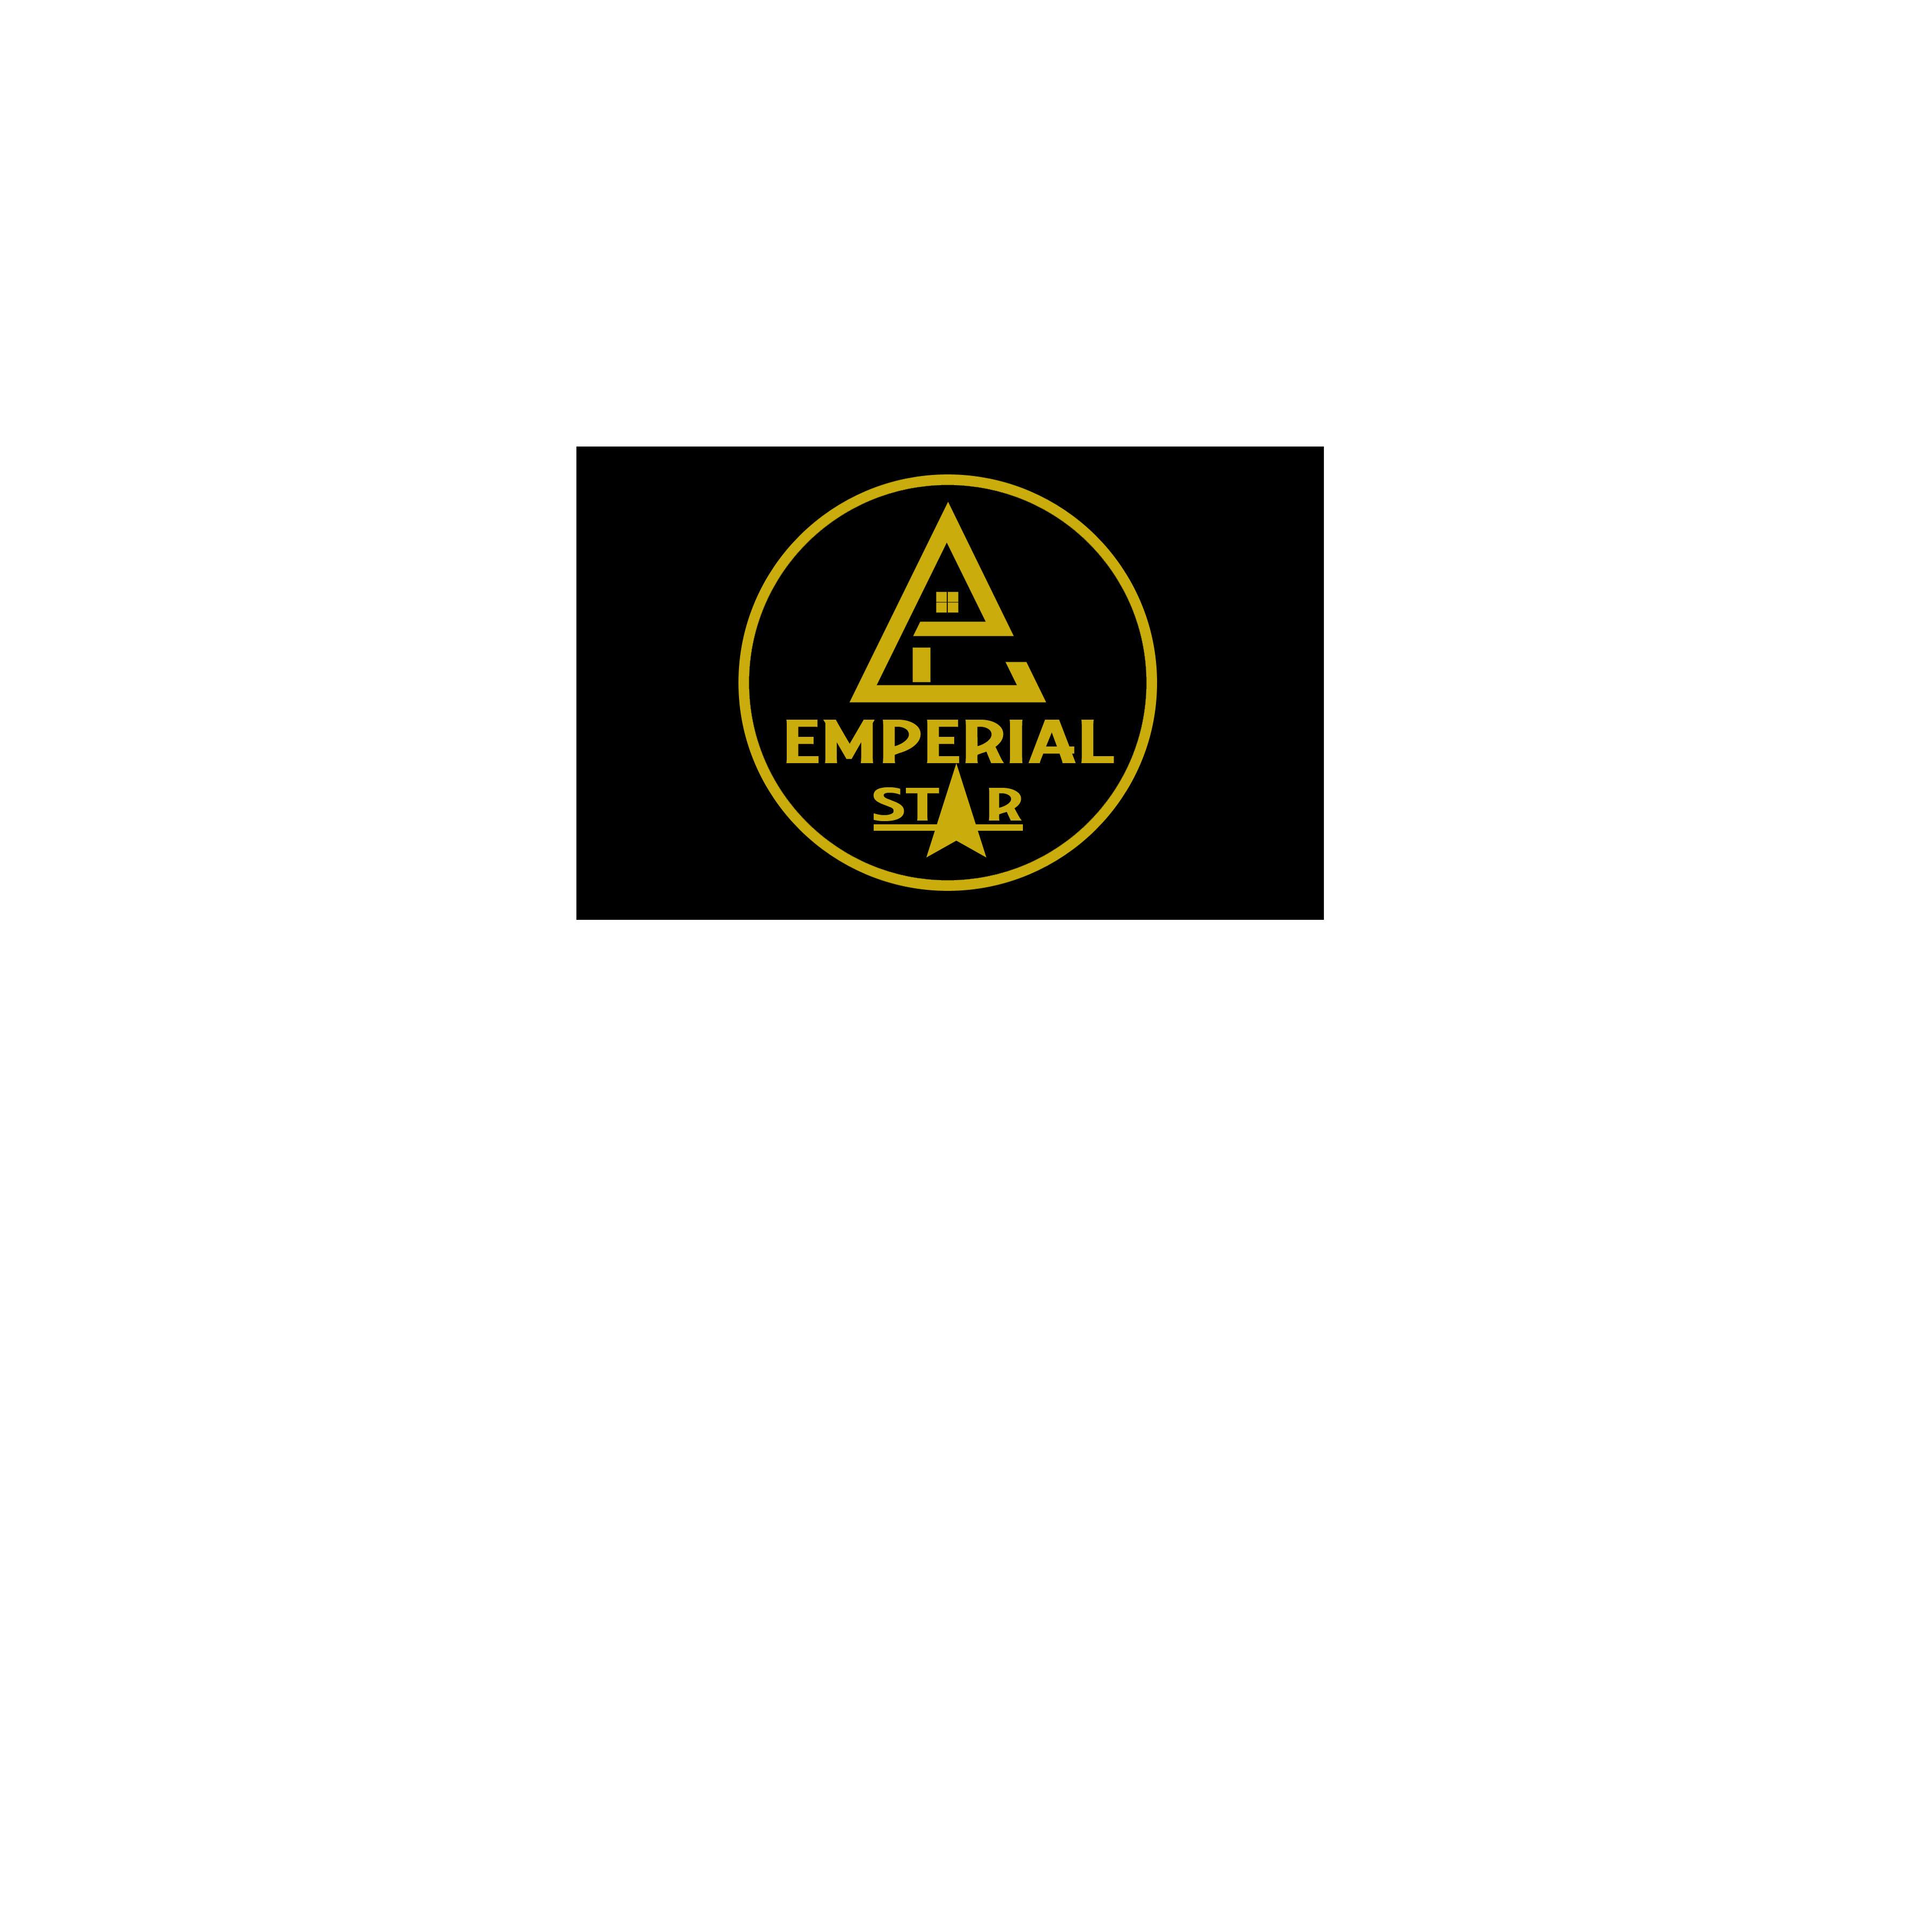 Logo Design by Alan Esclamado - Entry No. 141 in the Logo Design Contest Emperial Star Logo Design.